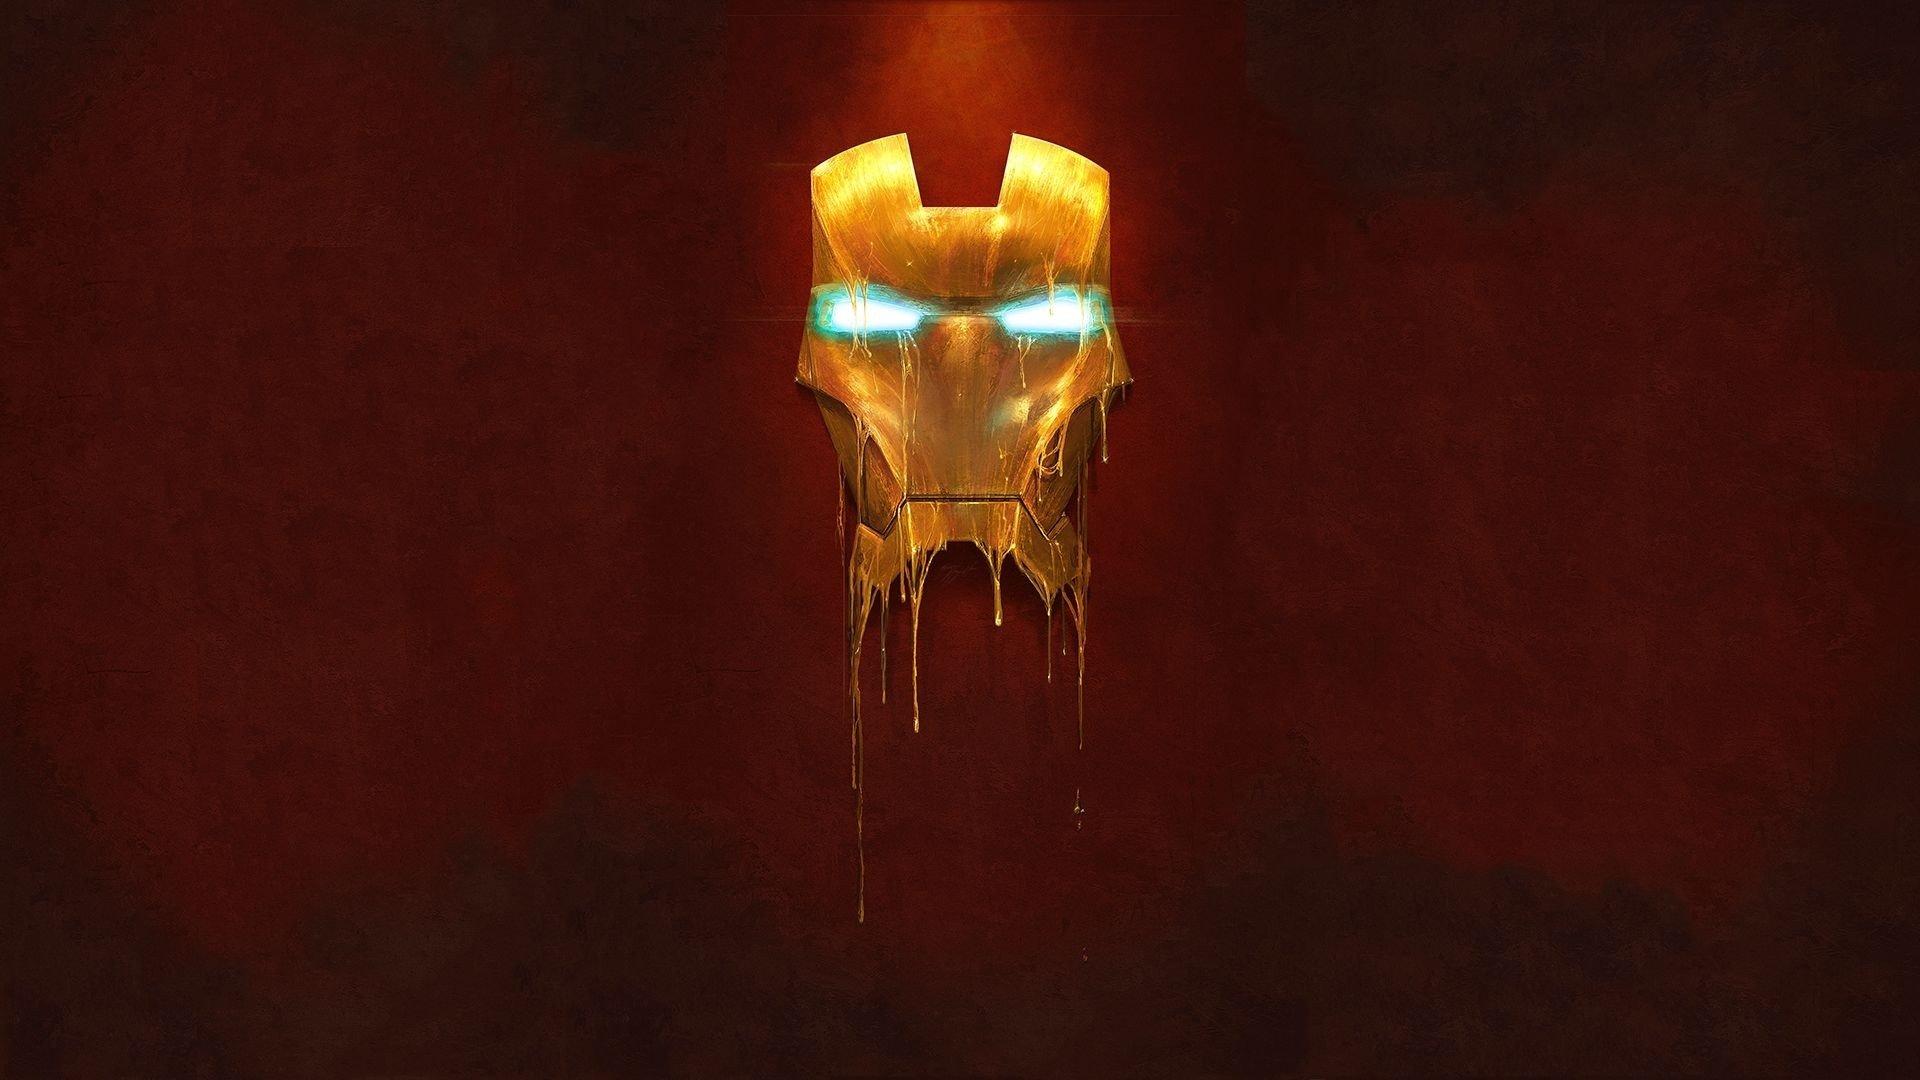 Iron Man Full HD Fond d'écran and Arrière-Plan | 1920x1080 | ID:250126